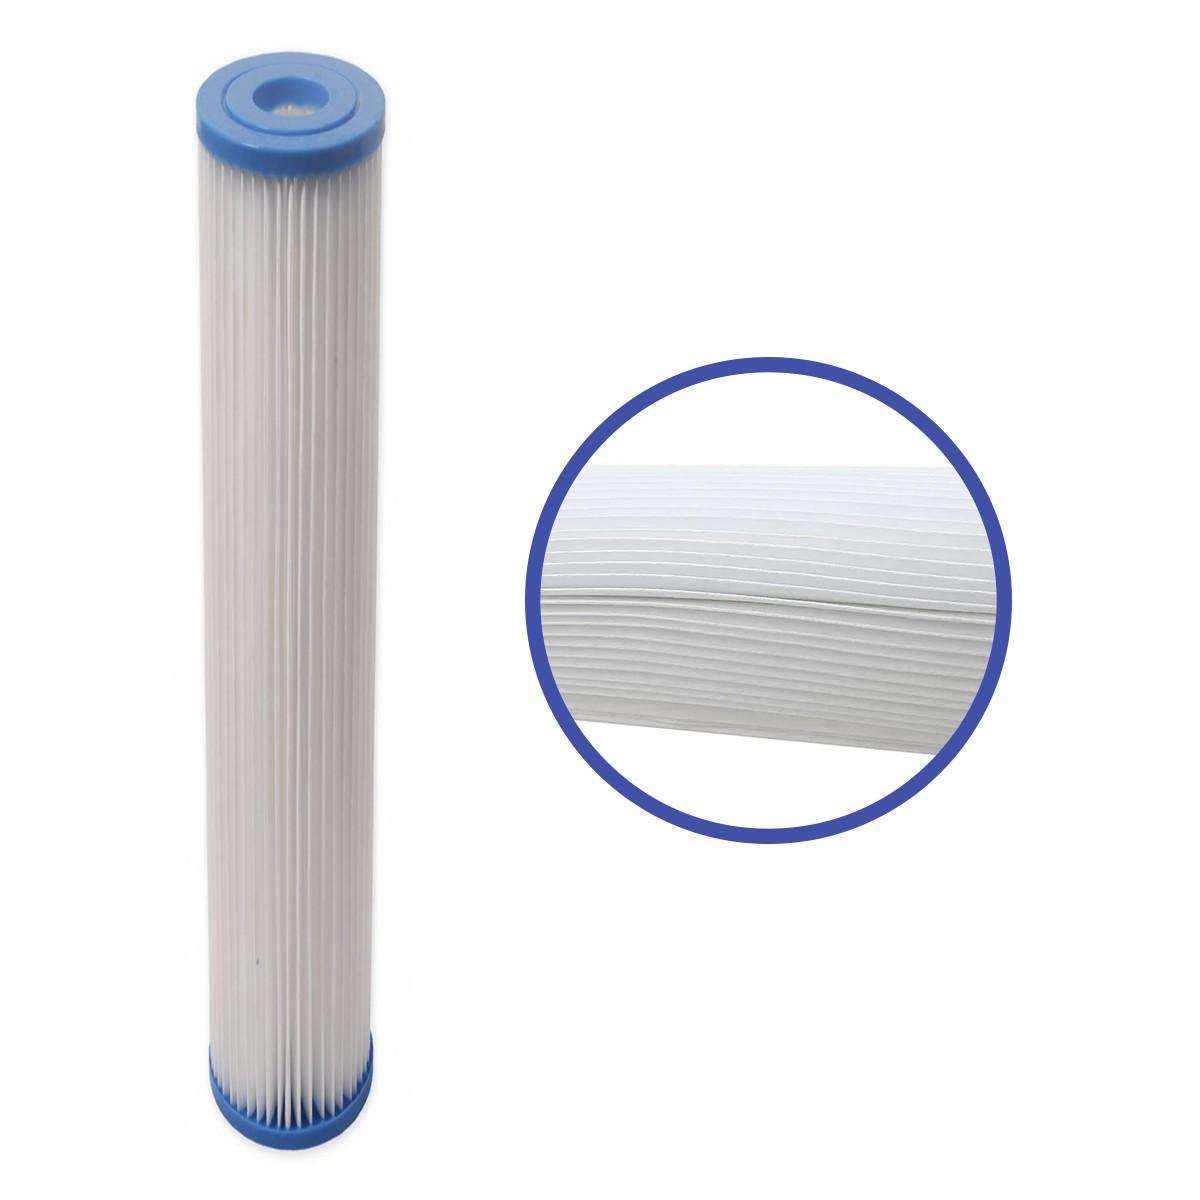 Refil Polipropileno Plissado Lavável 20 Polegadas - 20 micras